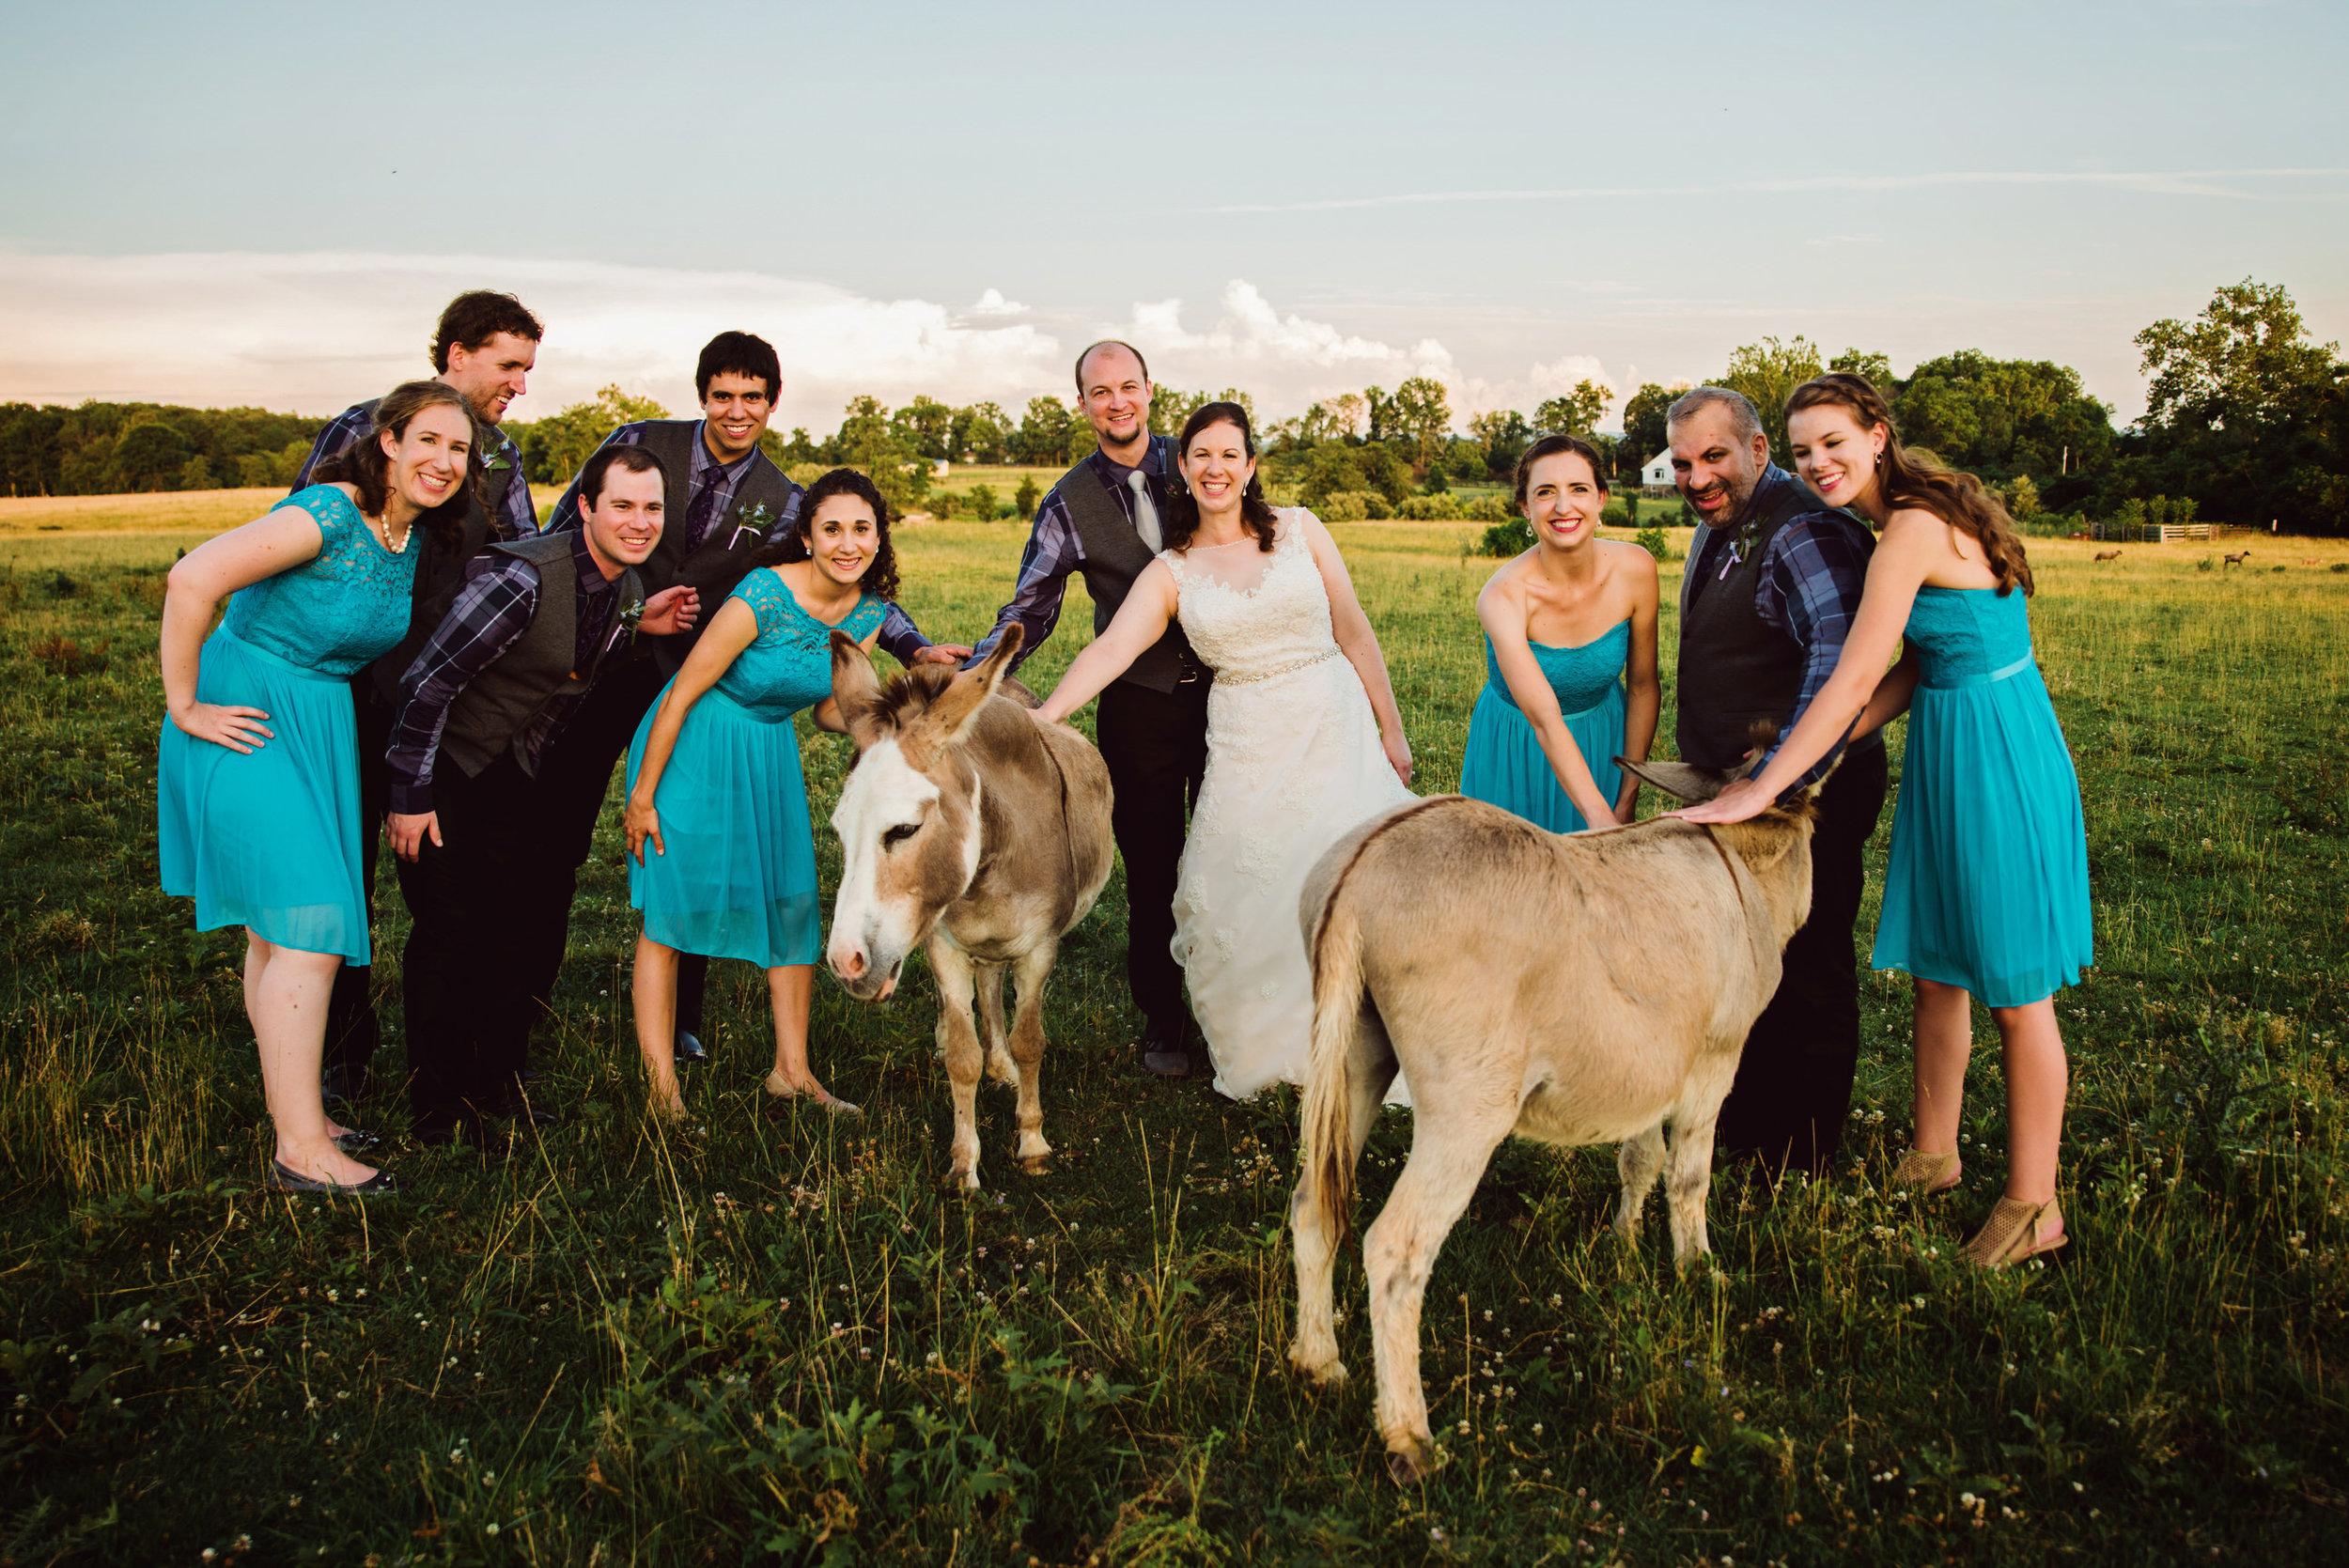 EastLynnFarmWedding-Steph&Aaron-Family-WP-265.jpg